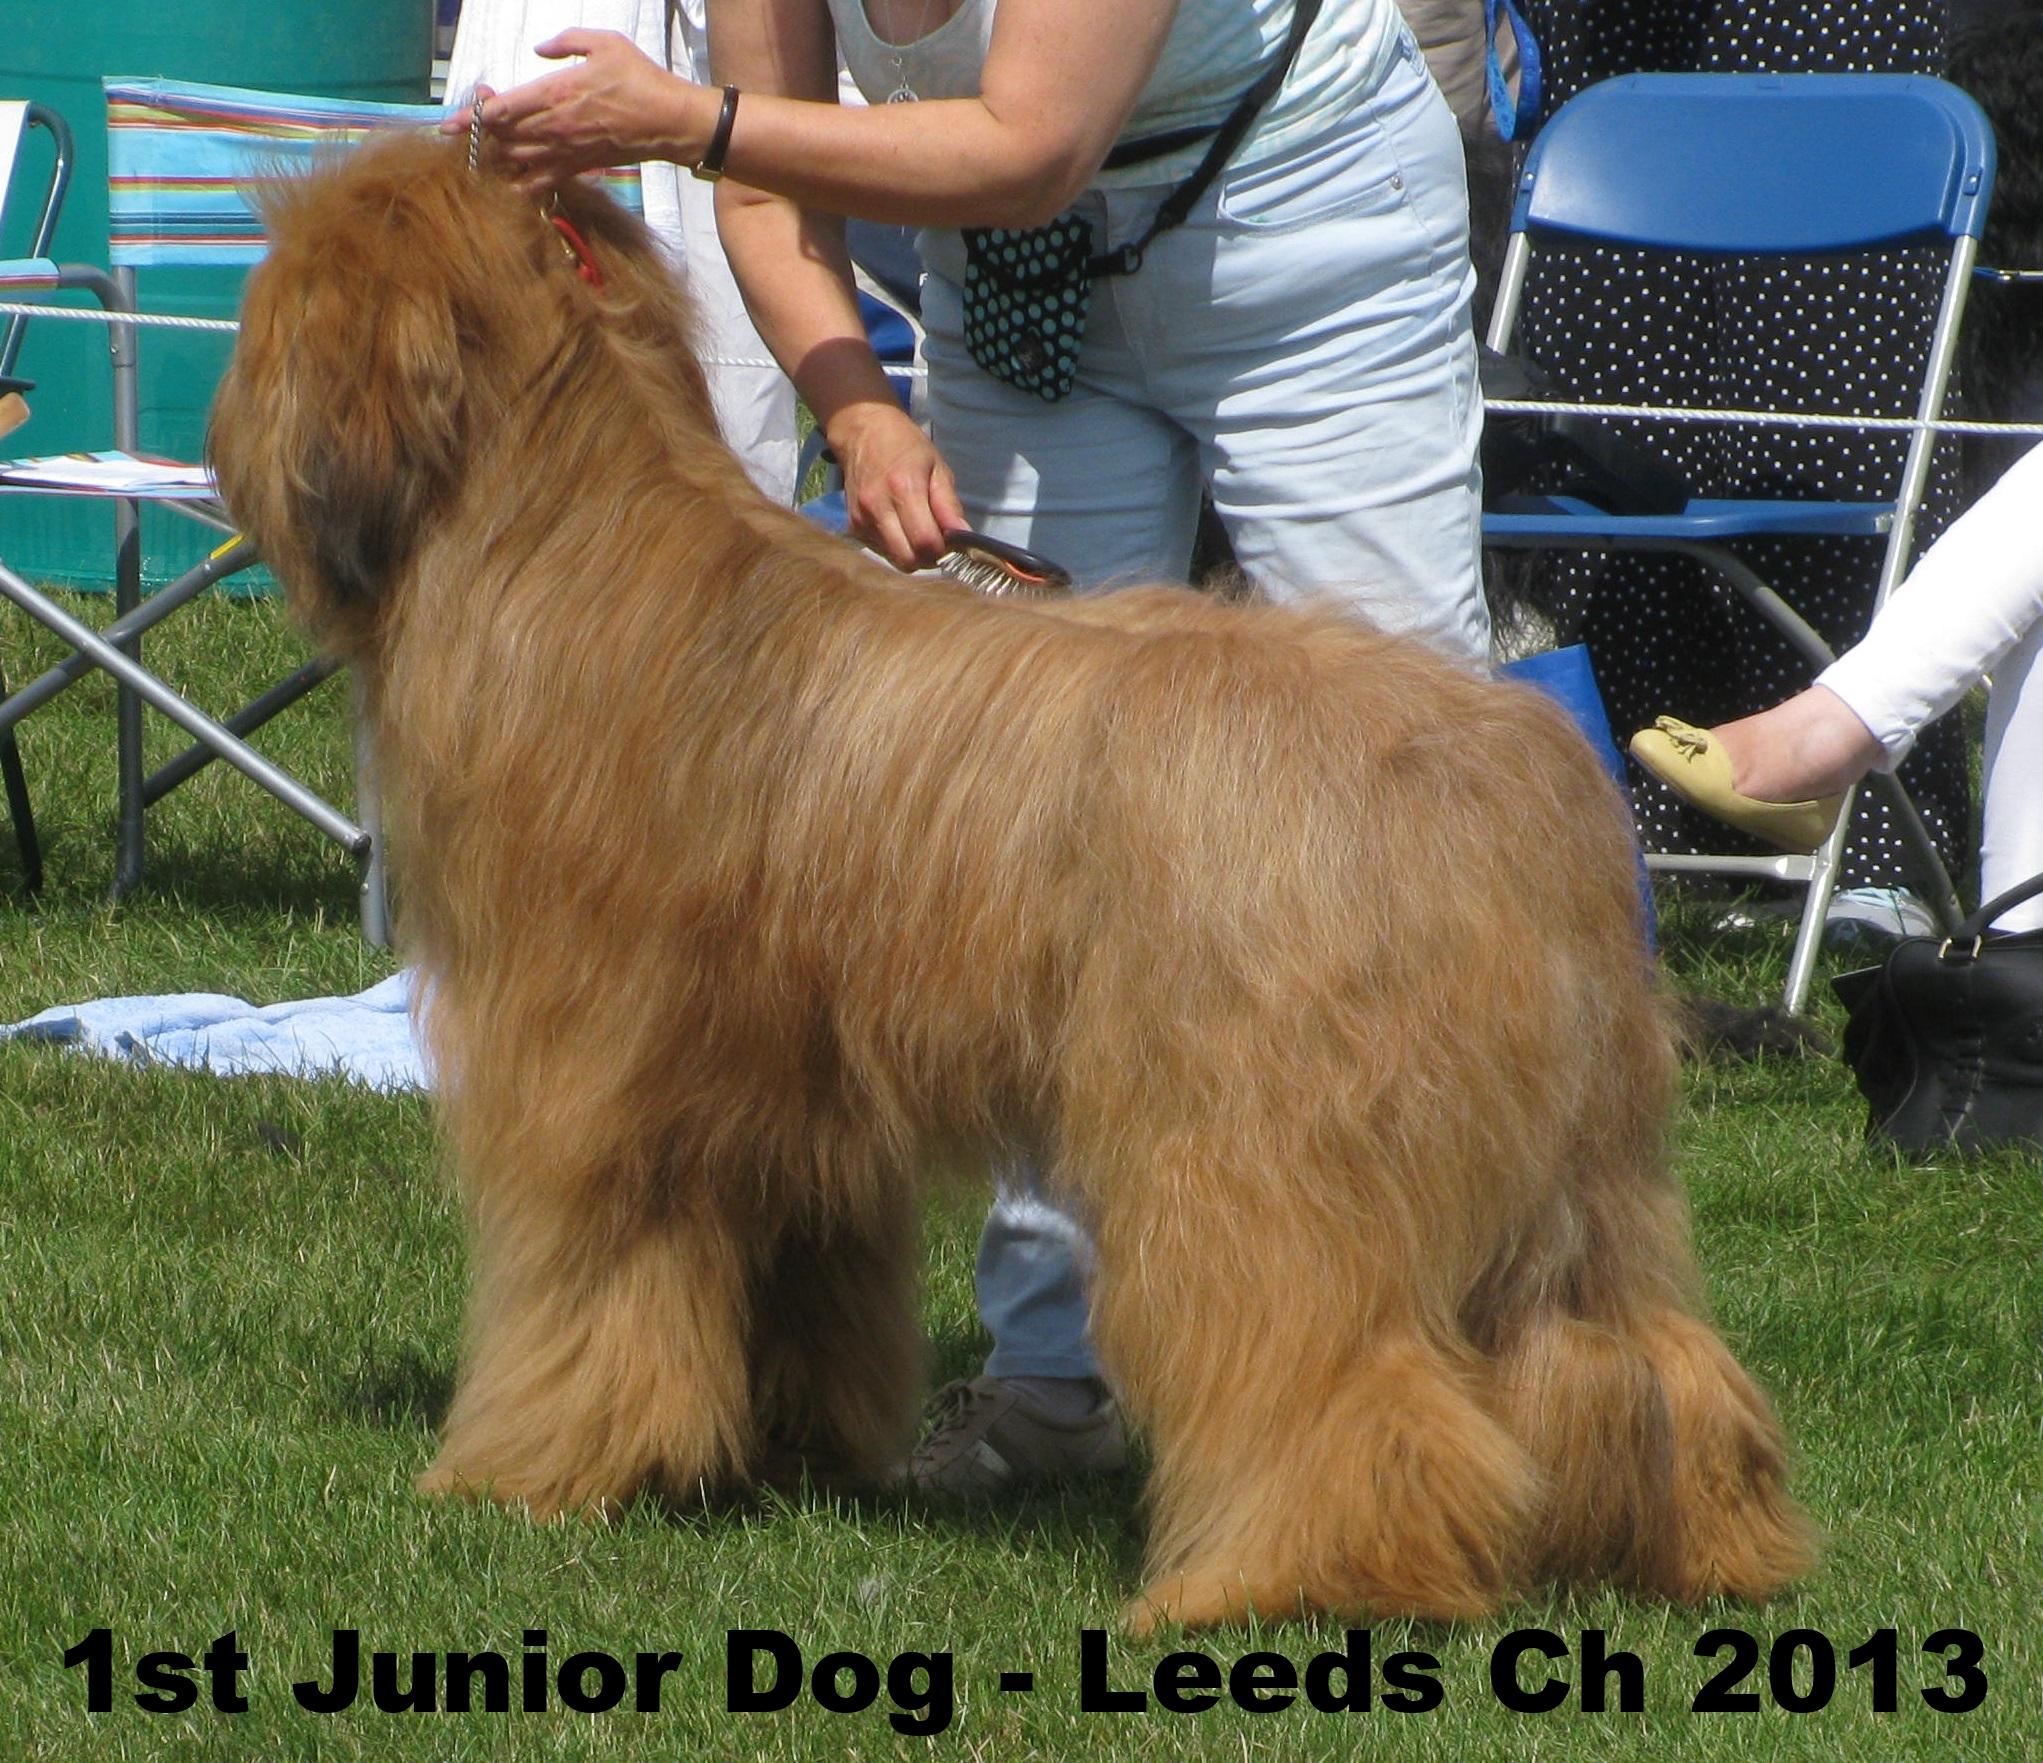 1st Junior Dog - Leeds July 2013.JPG